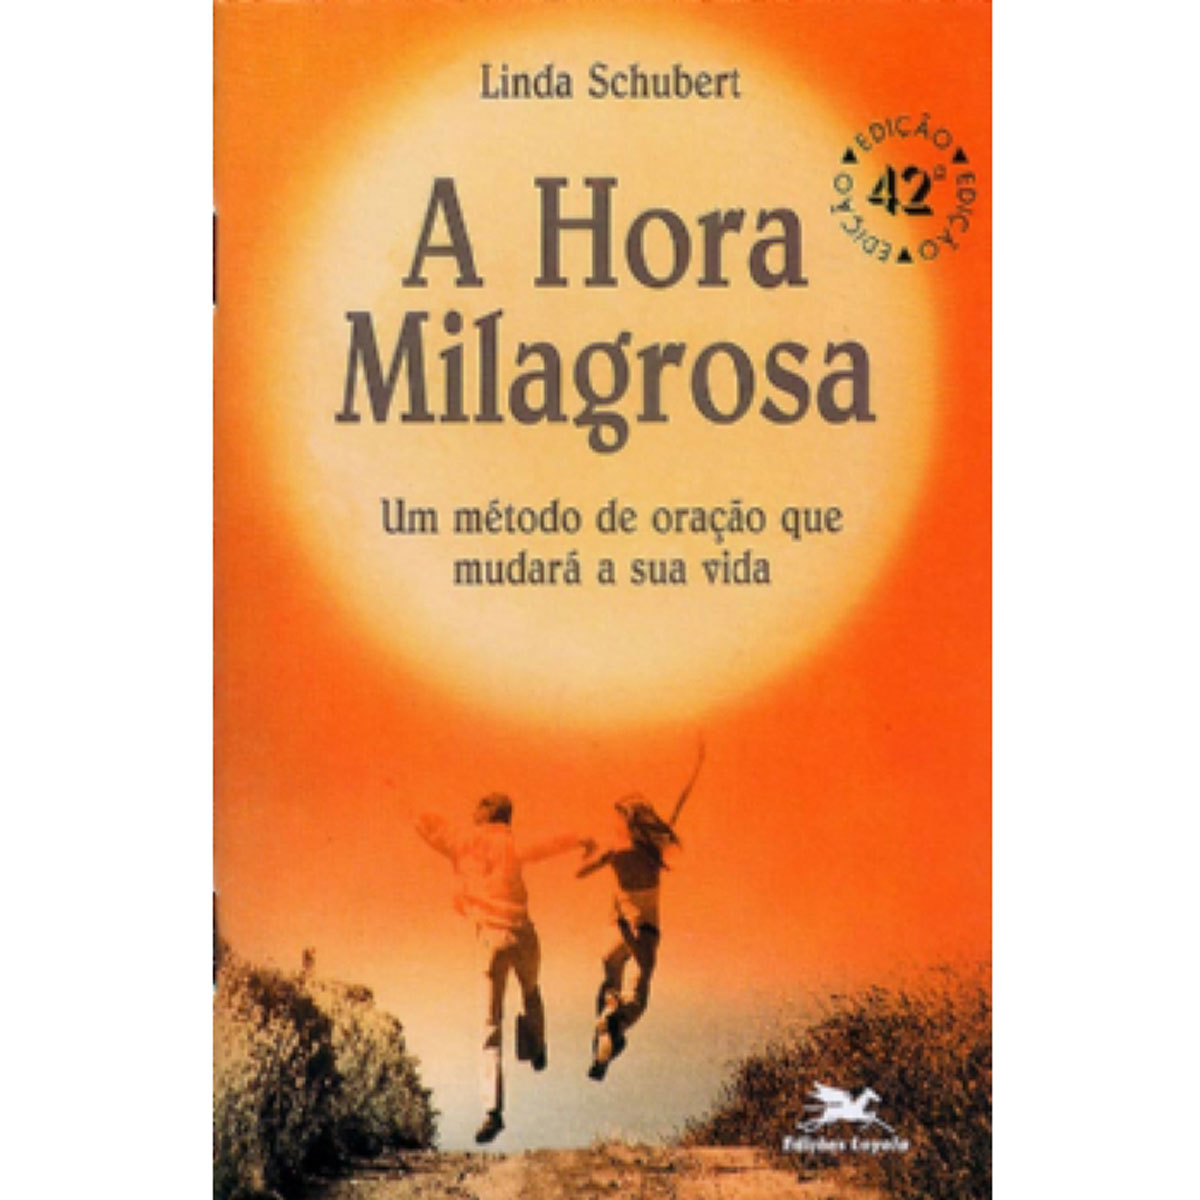 A Hora Milagrosa - Linda Schubert  - VindVedShop - Distribuidora Catolica